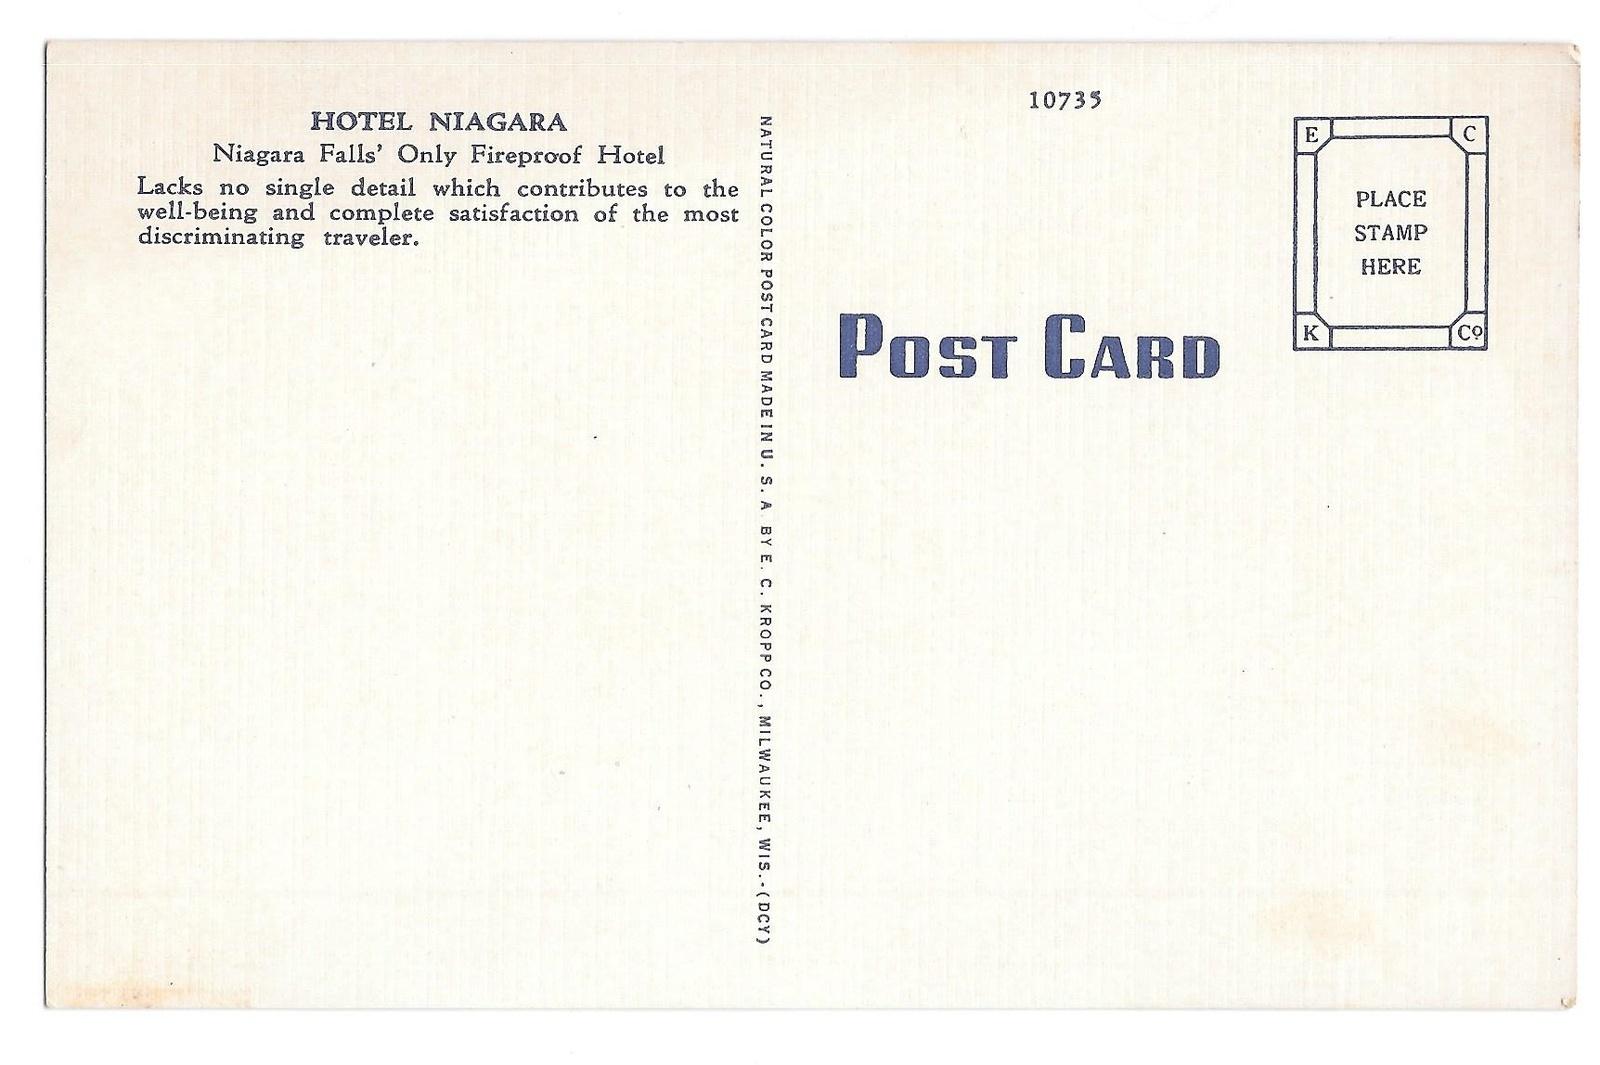 Niagara Falls NY Hotel Niagara Vintage Kropp Linen Postcard